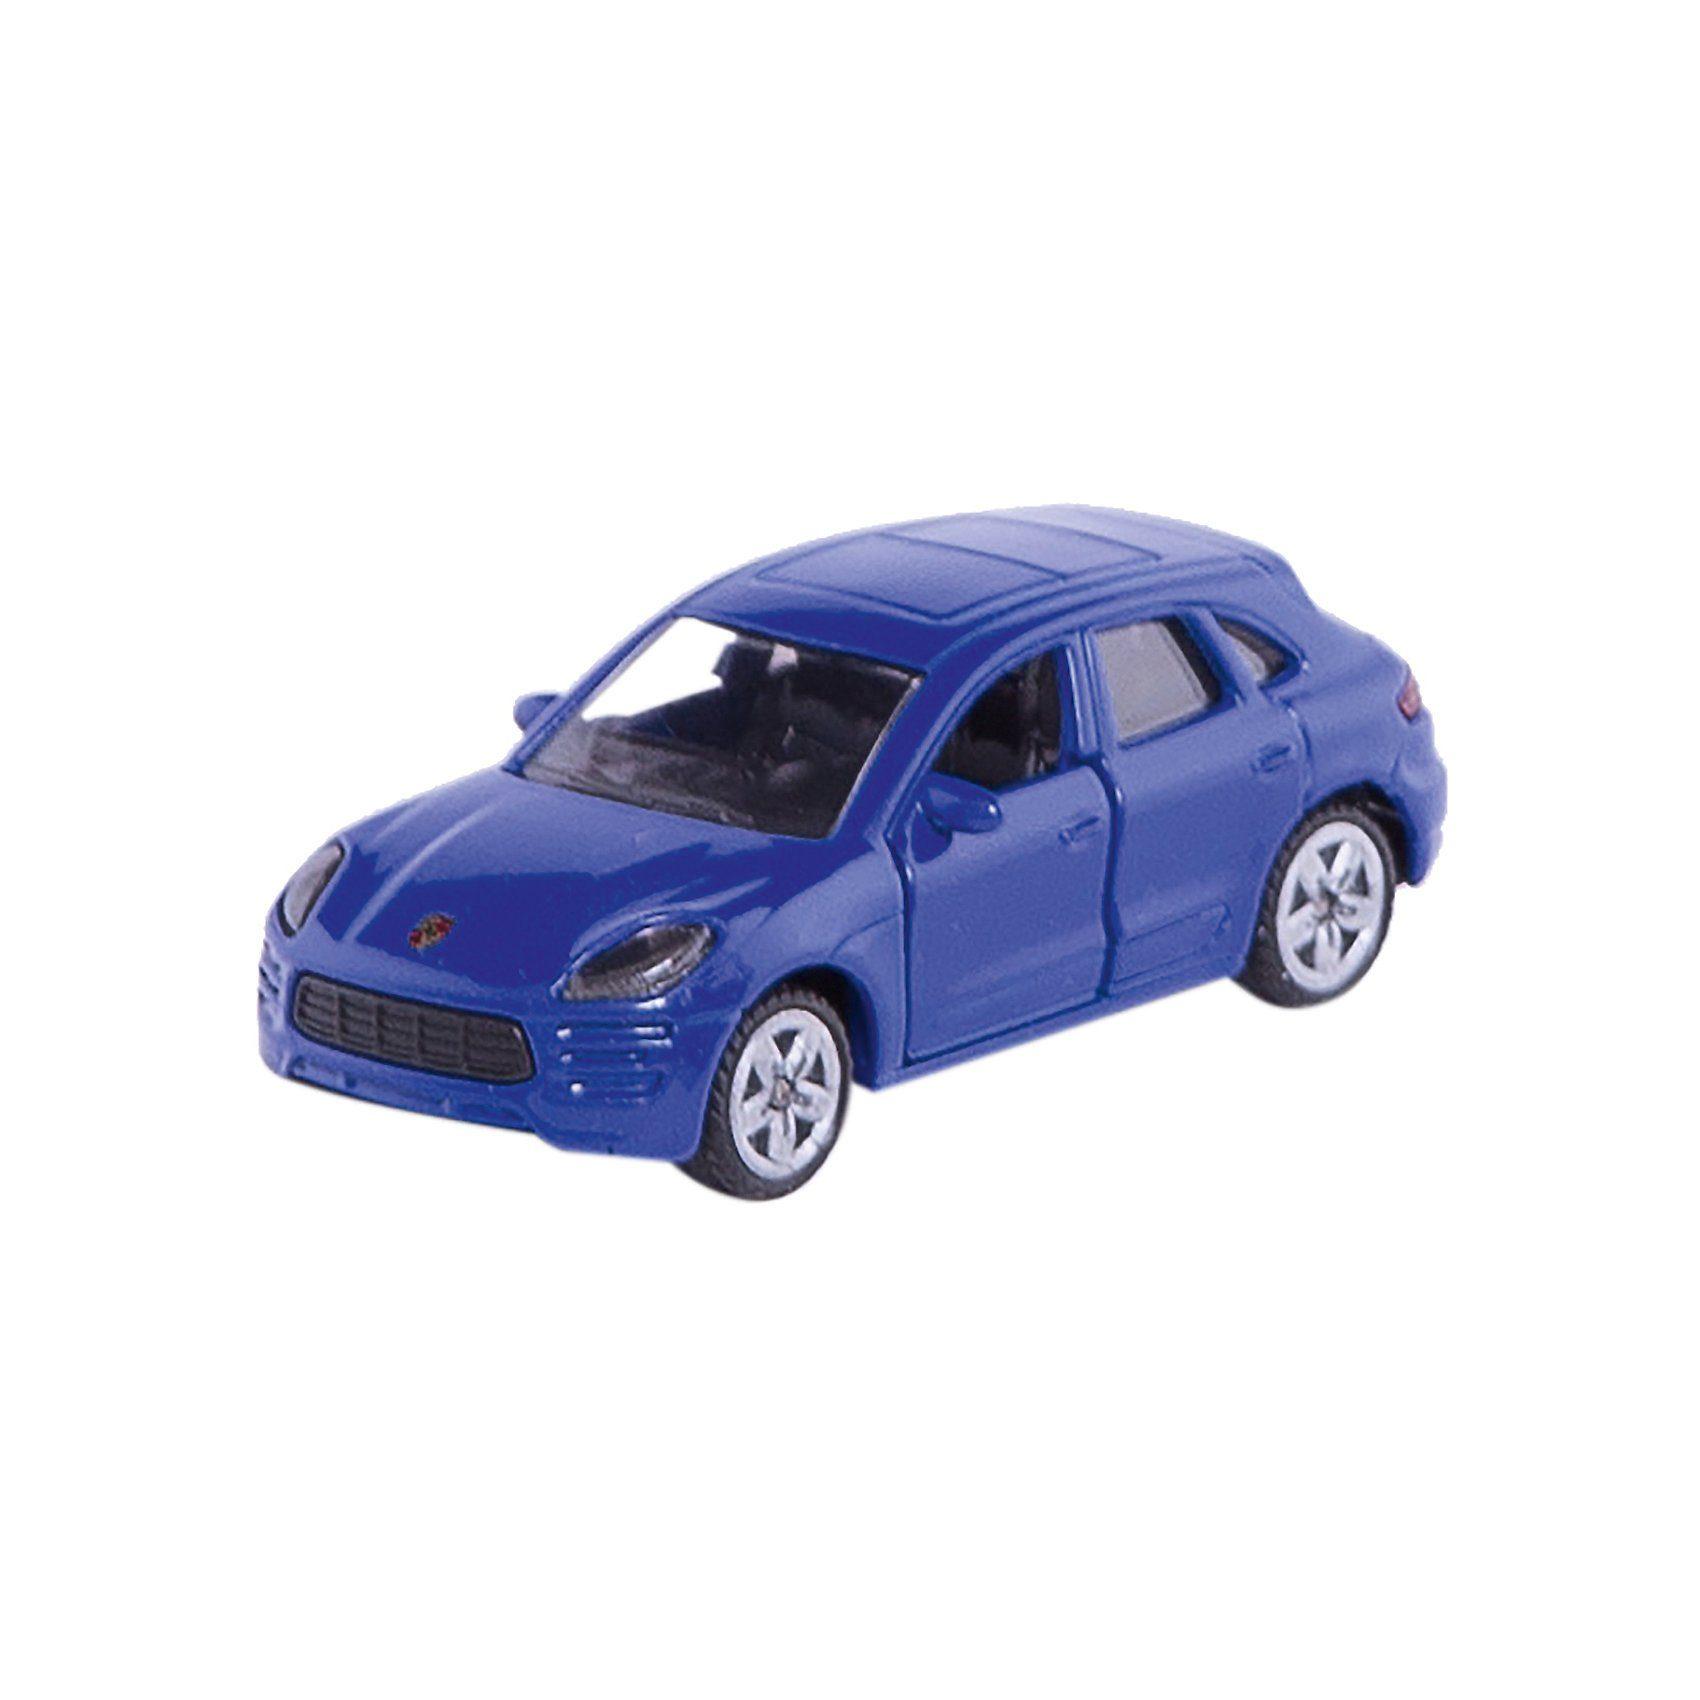 Siku 1452 Porsche Macan Turbo